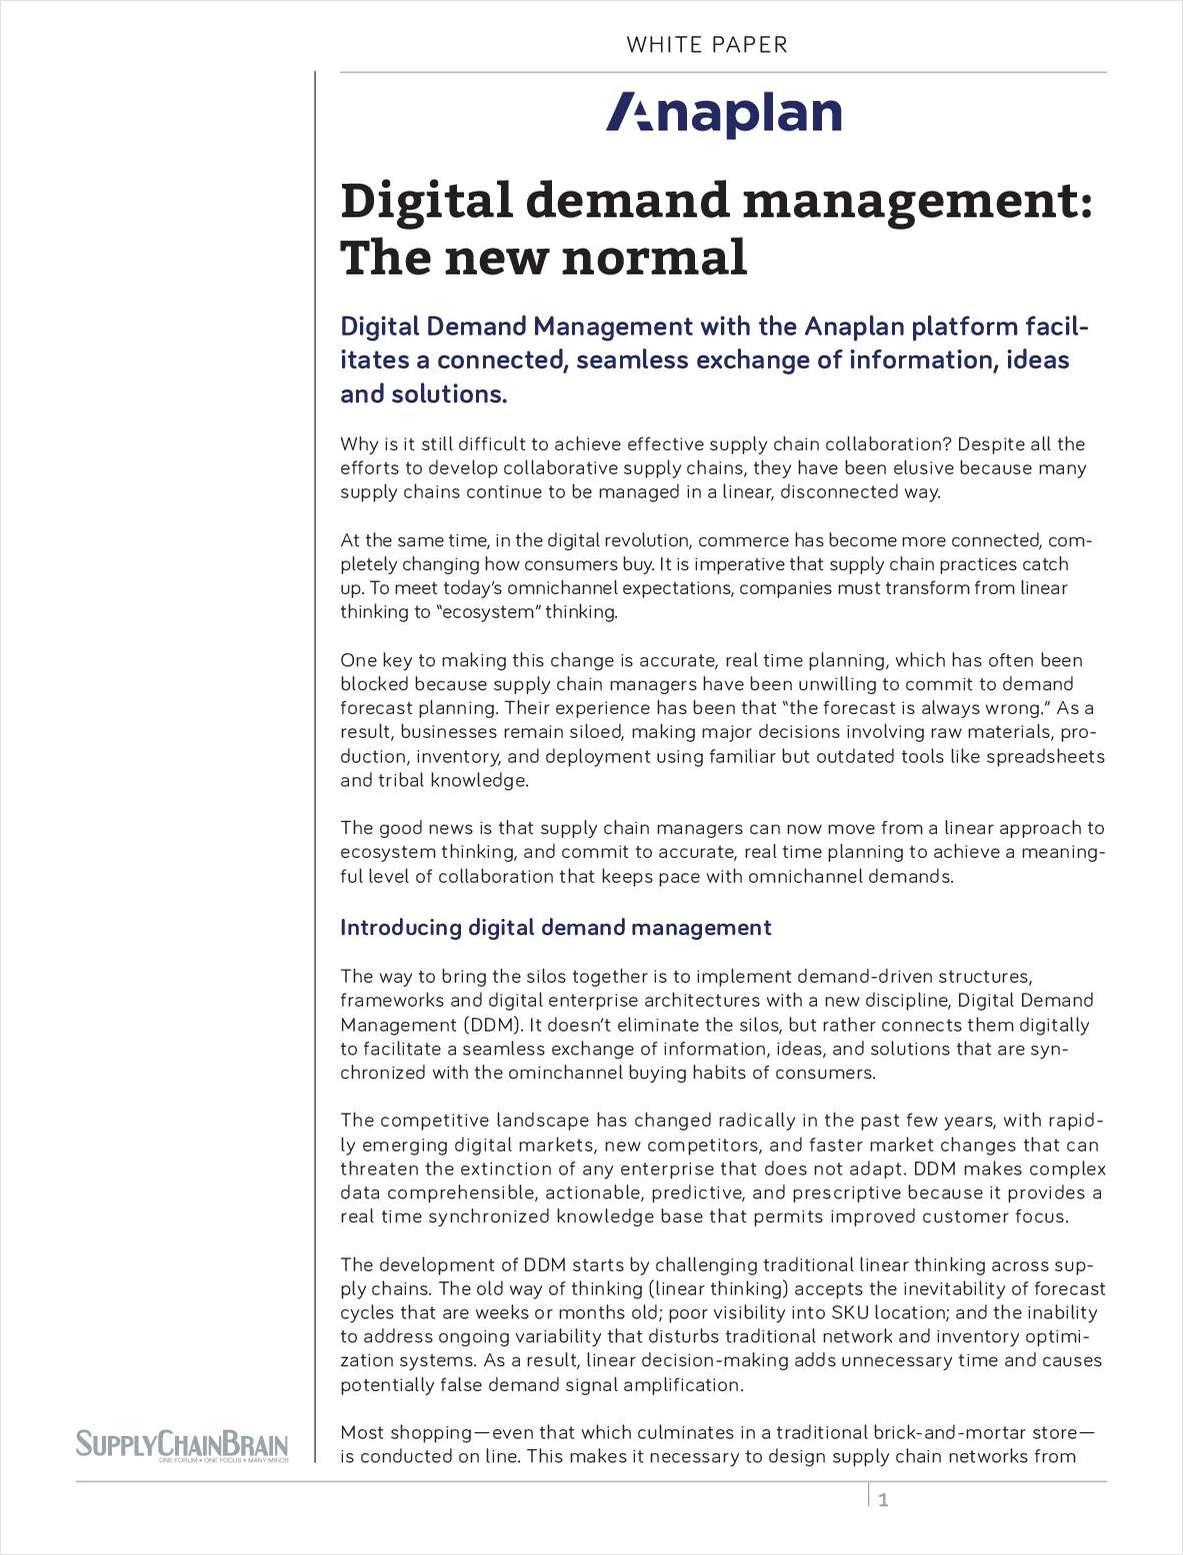 Digital Demand Management: The New Normal